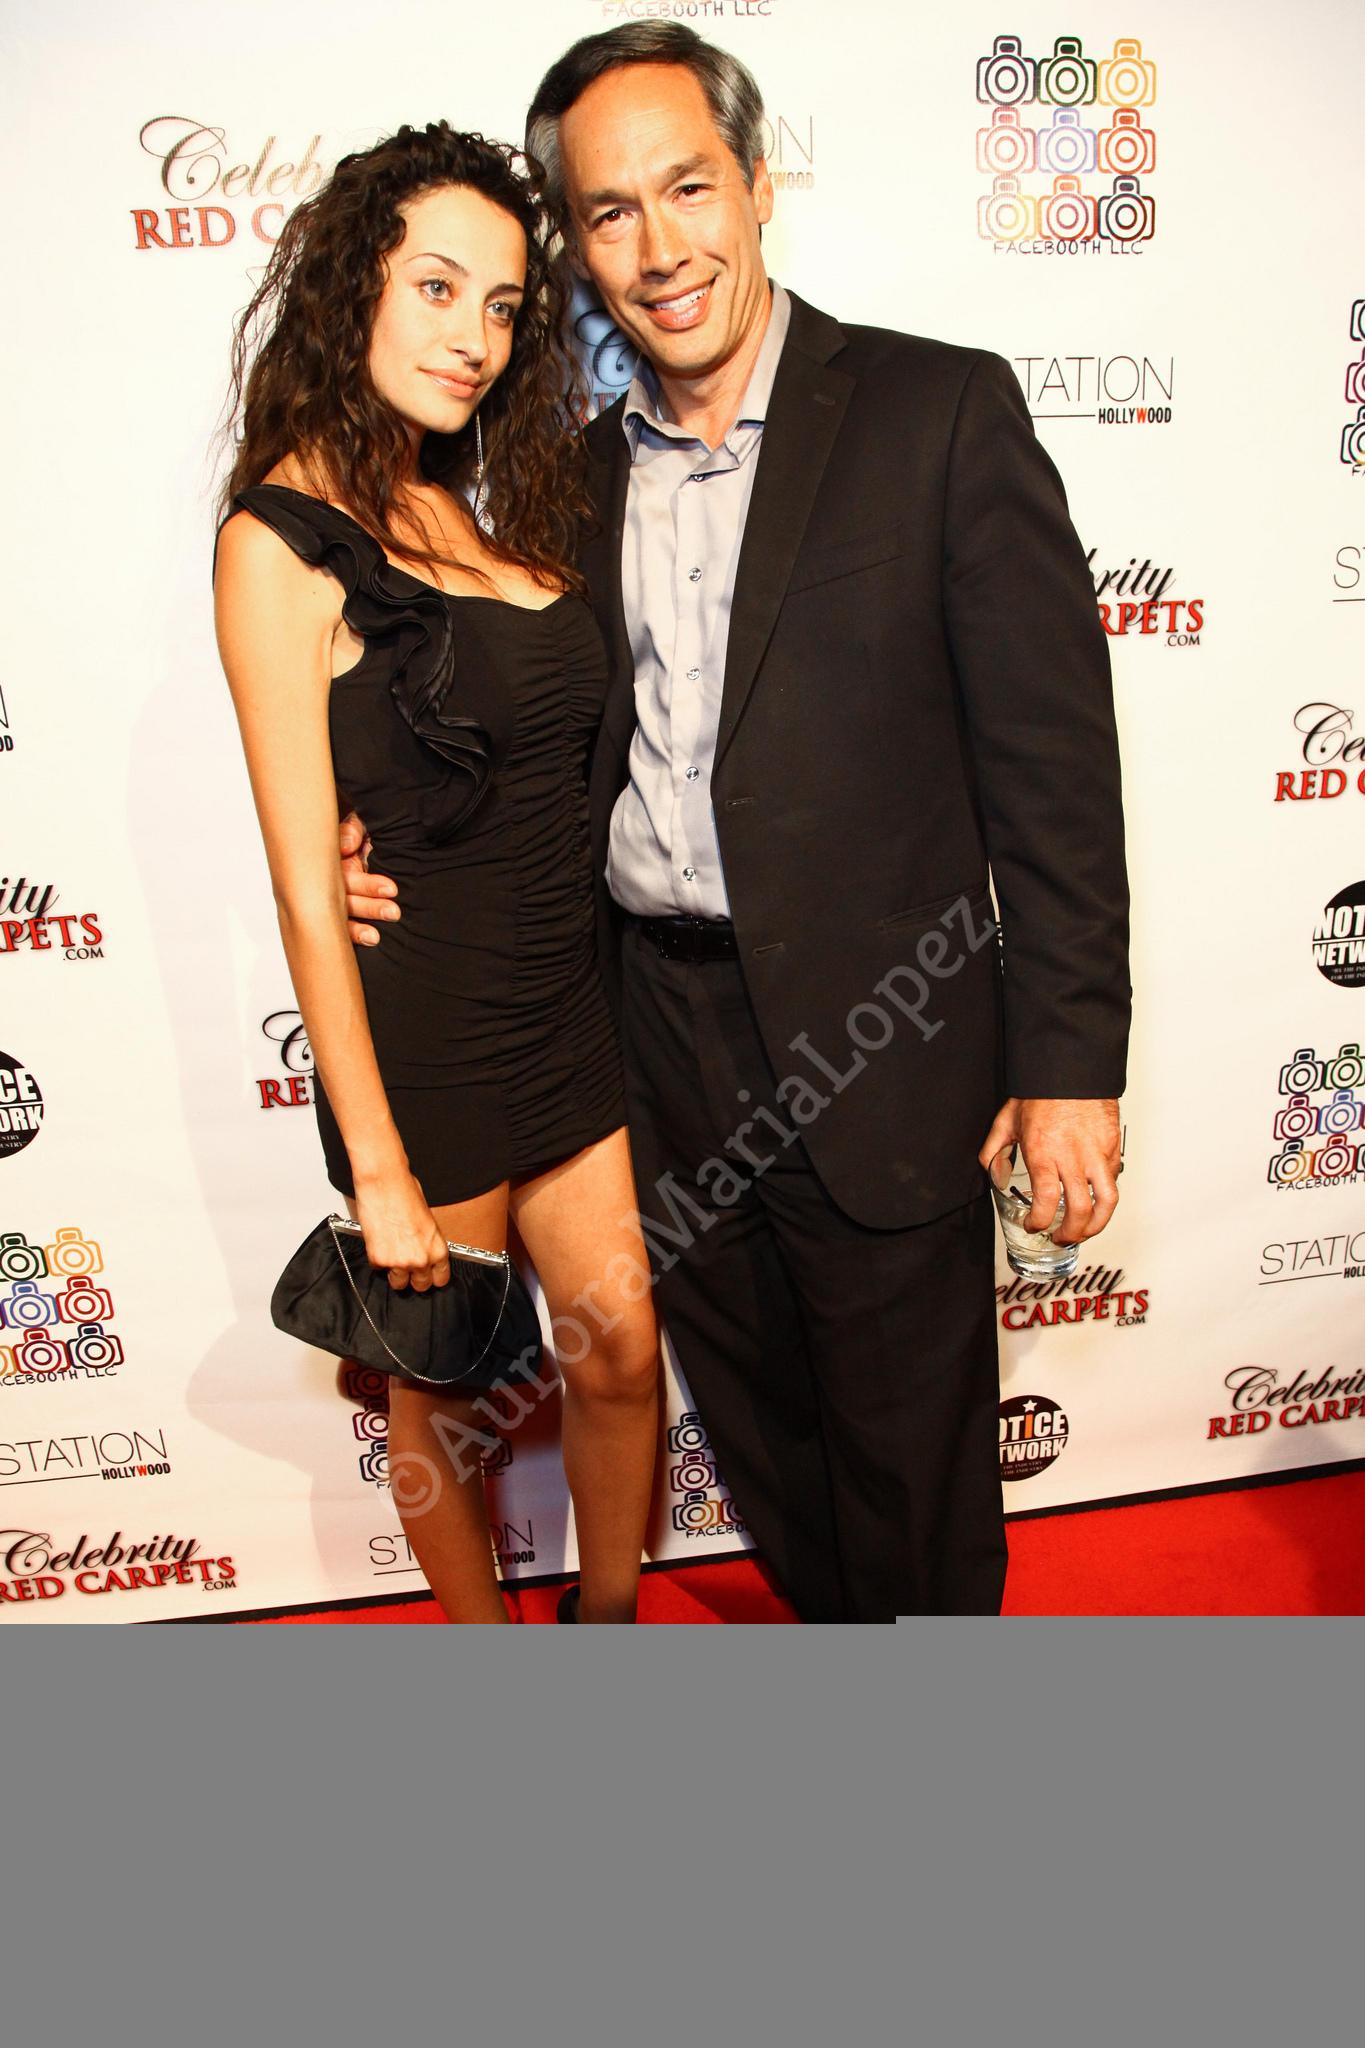 Auora & Steve MTV Music Awards 9-2012